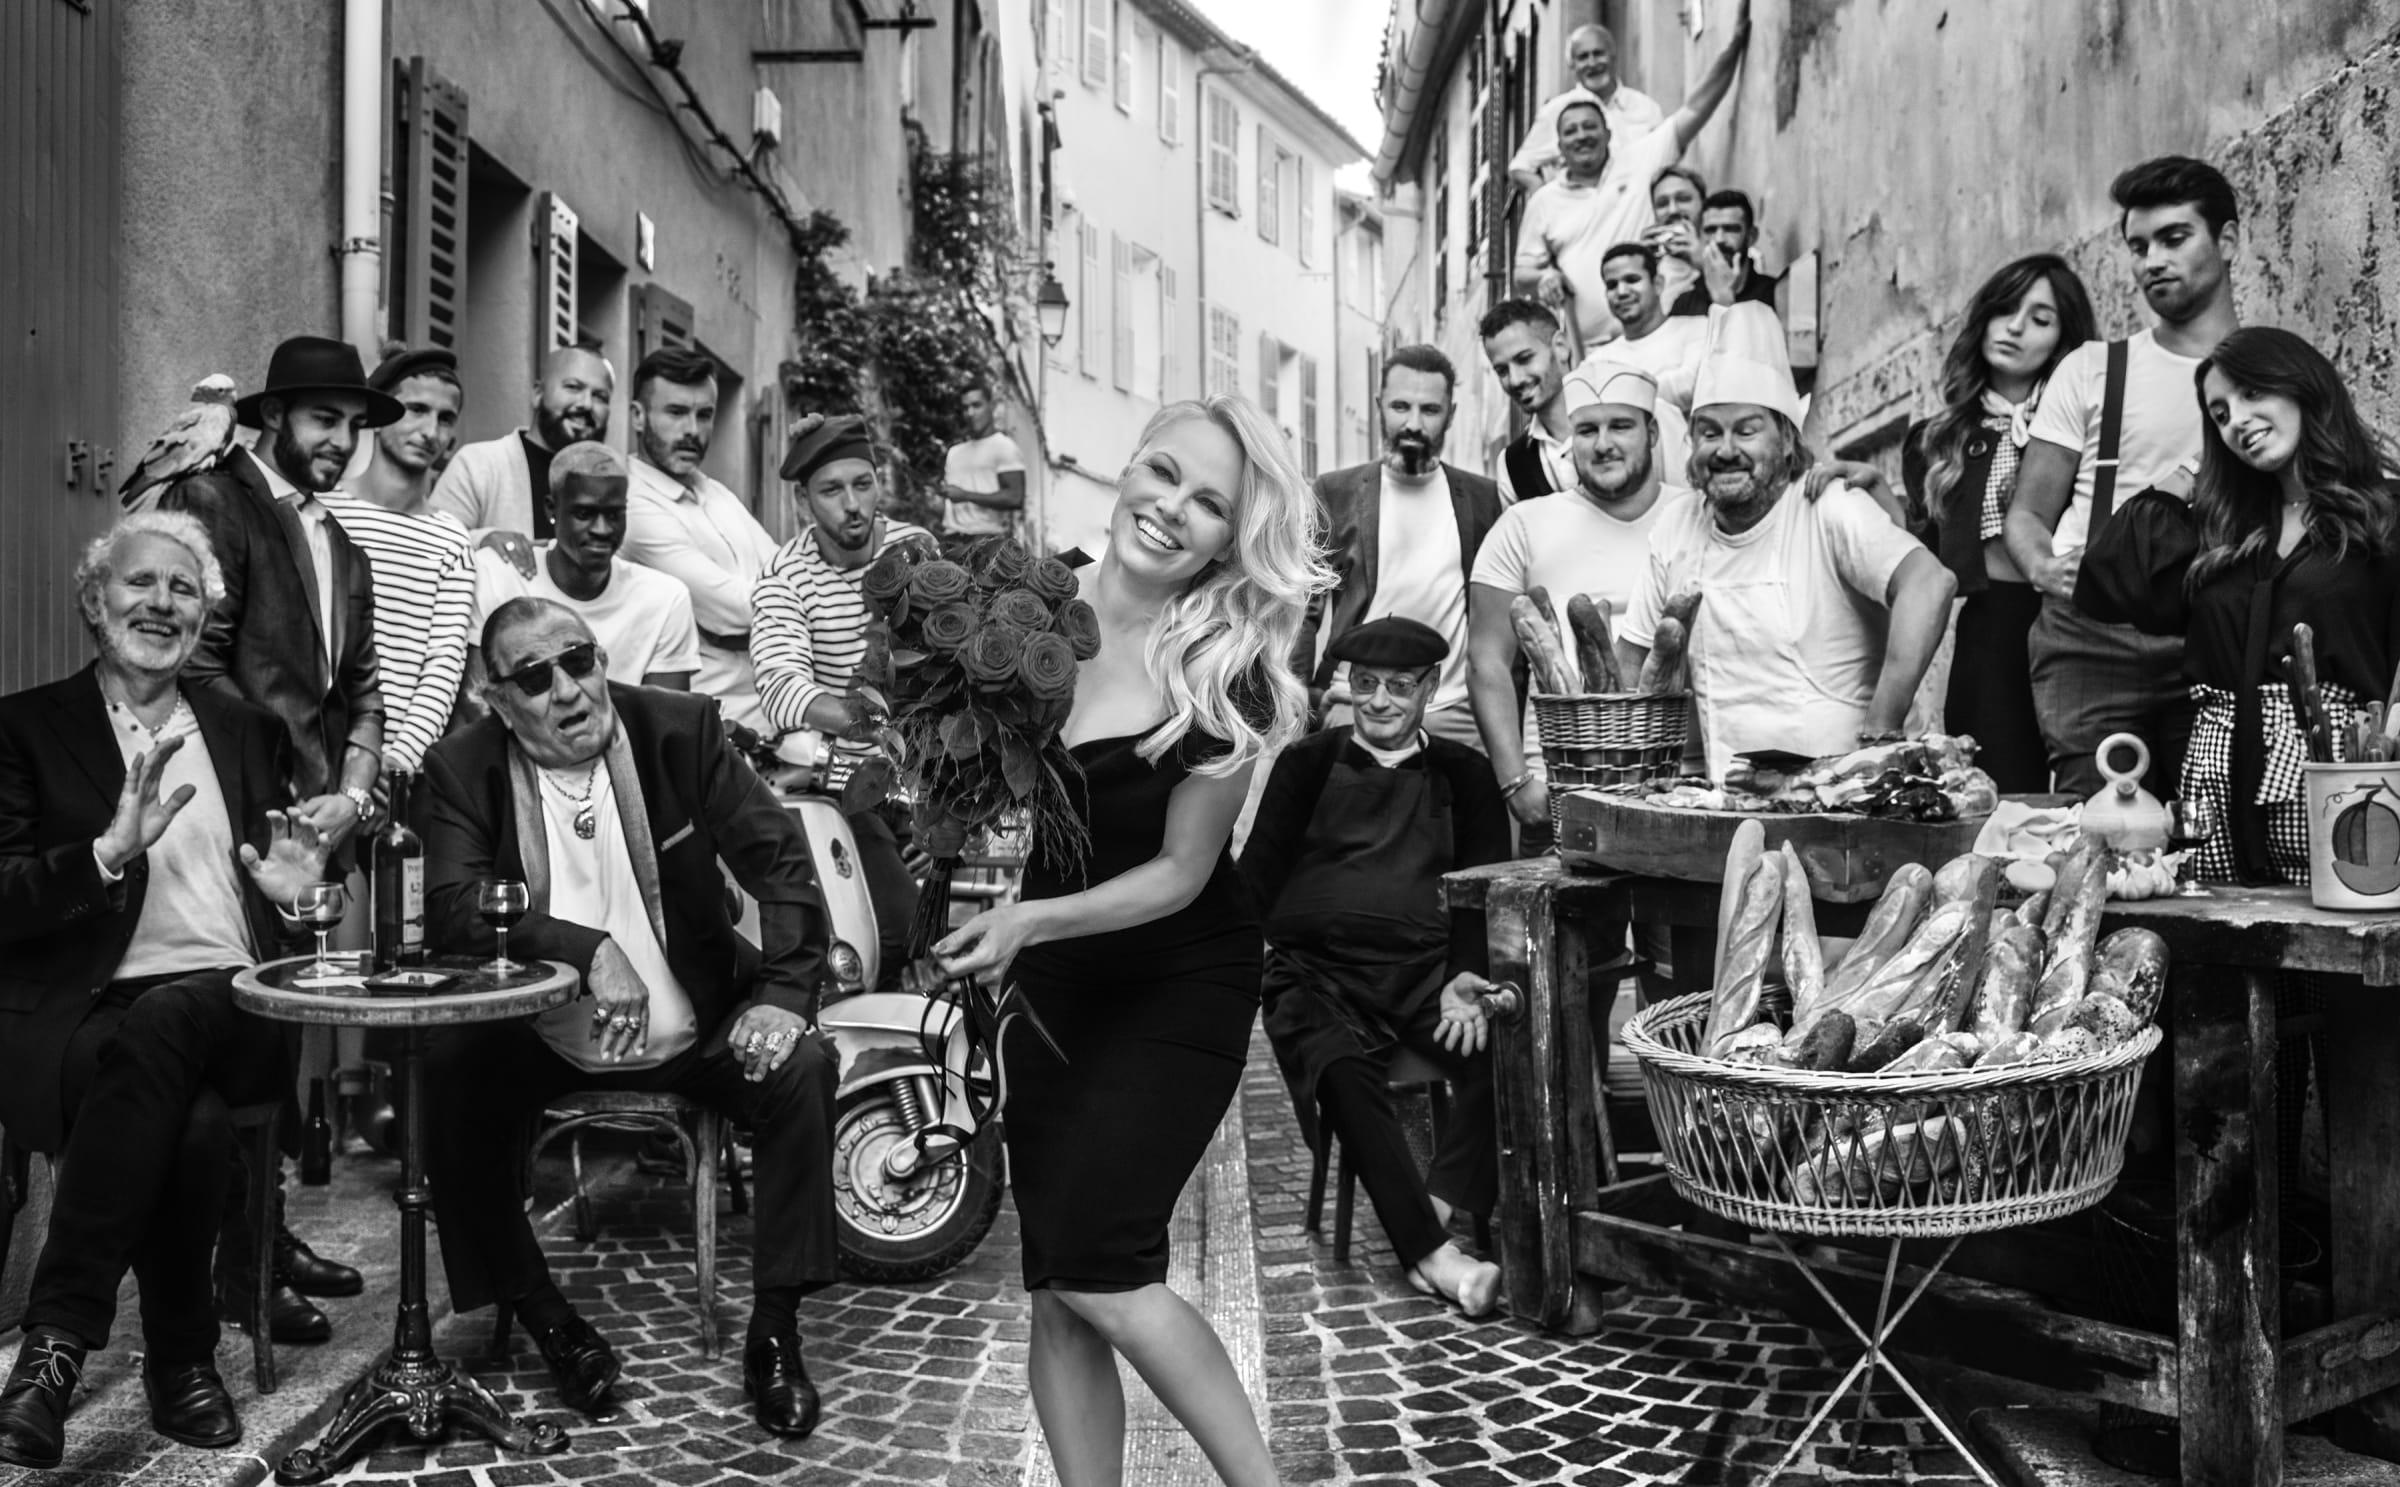 David Yarrow features Pamela Anderson in new charity artwork